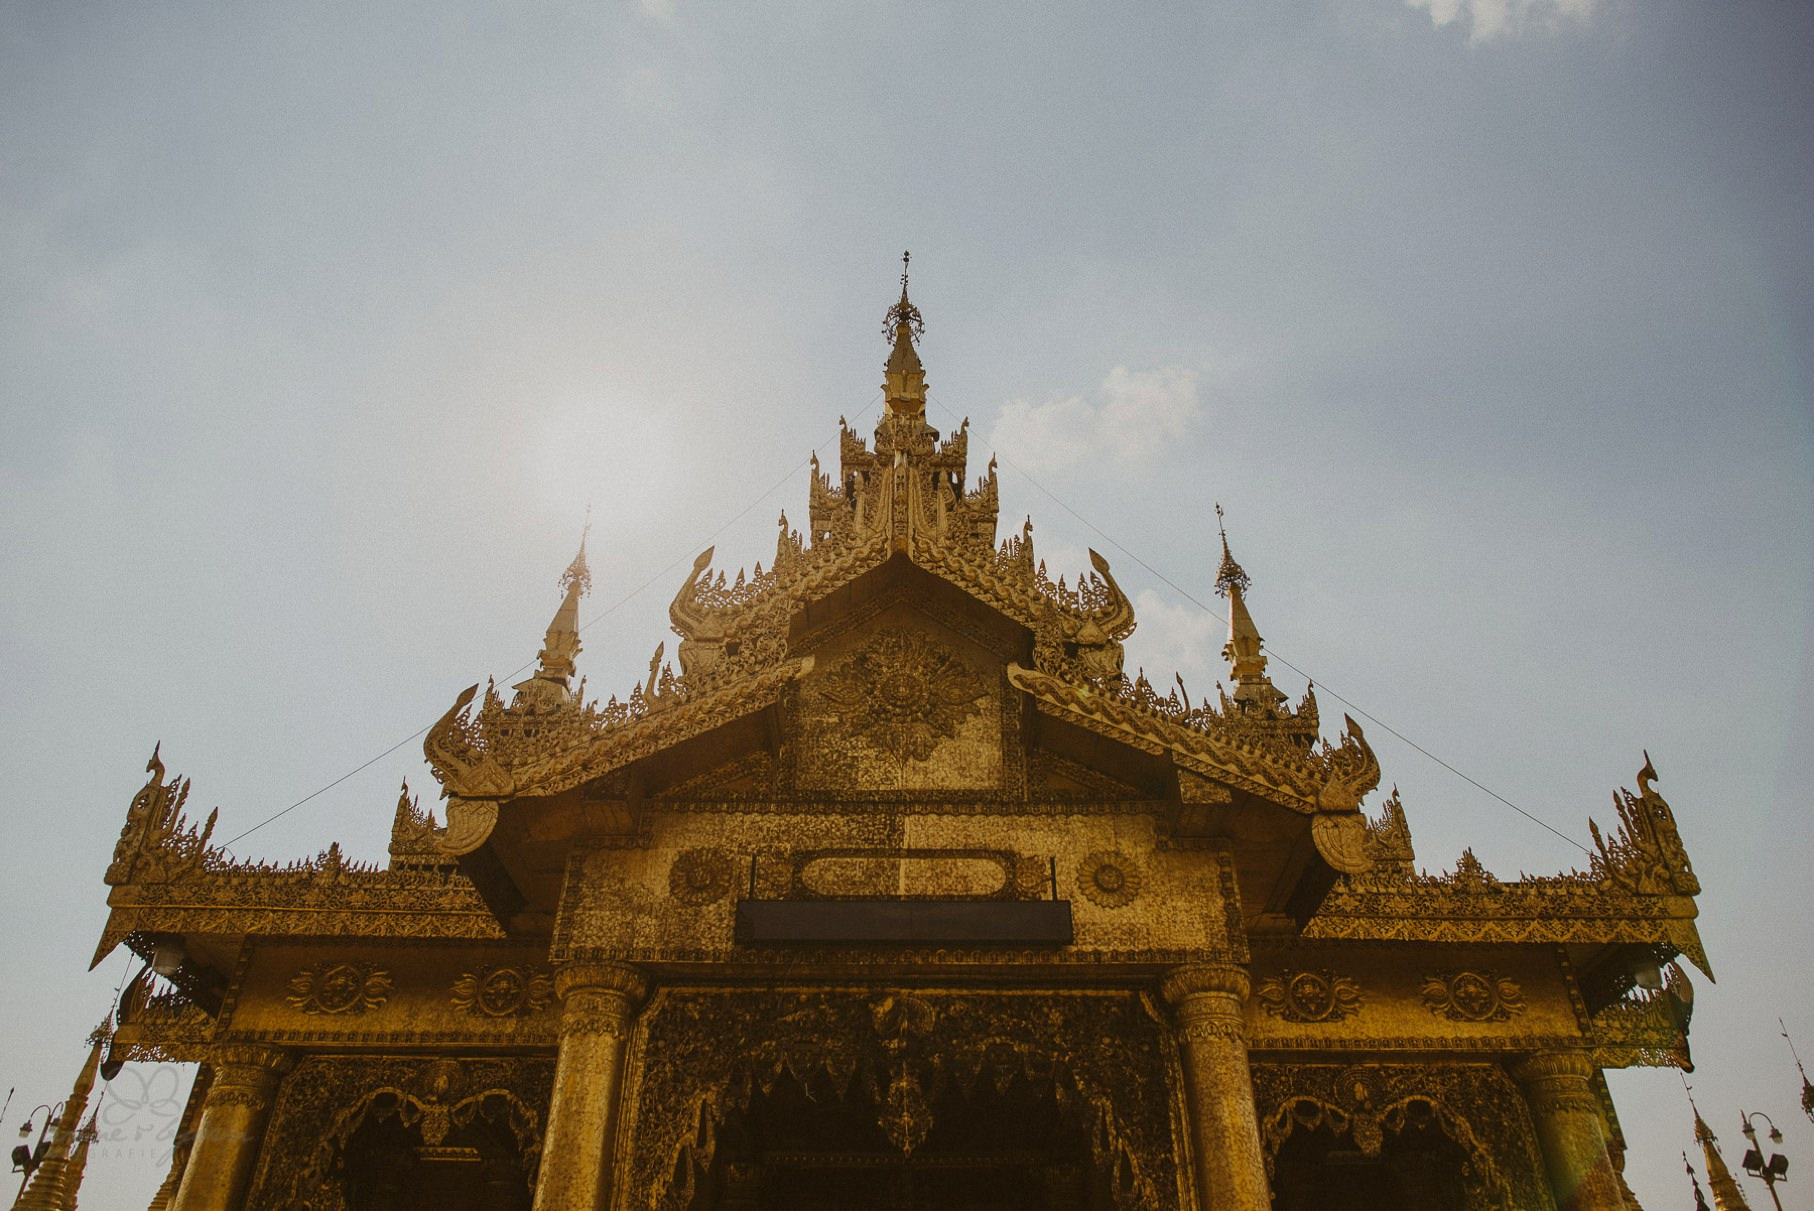 0018 yangon mandalay d76 4372 - Großstädte Myanmars - Yangon & Mandalay